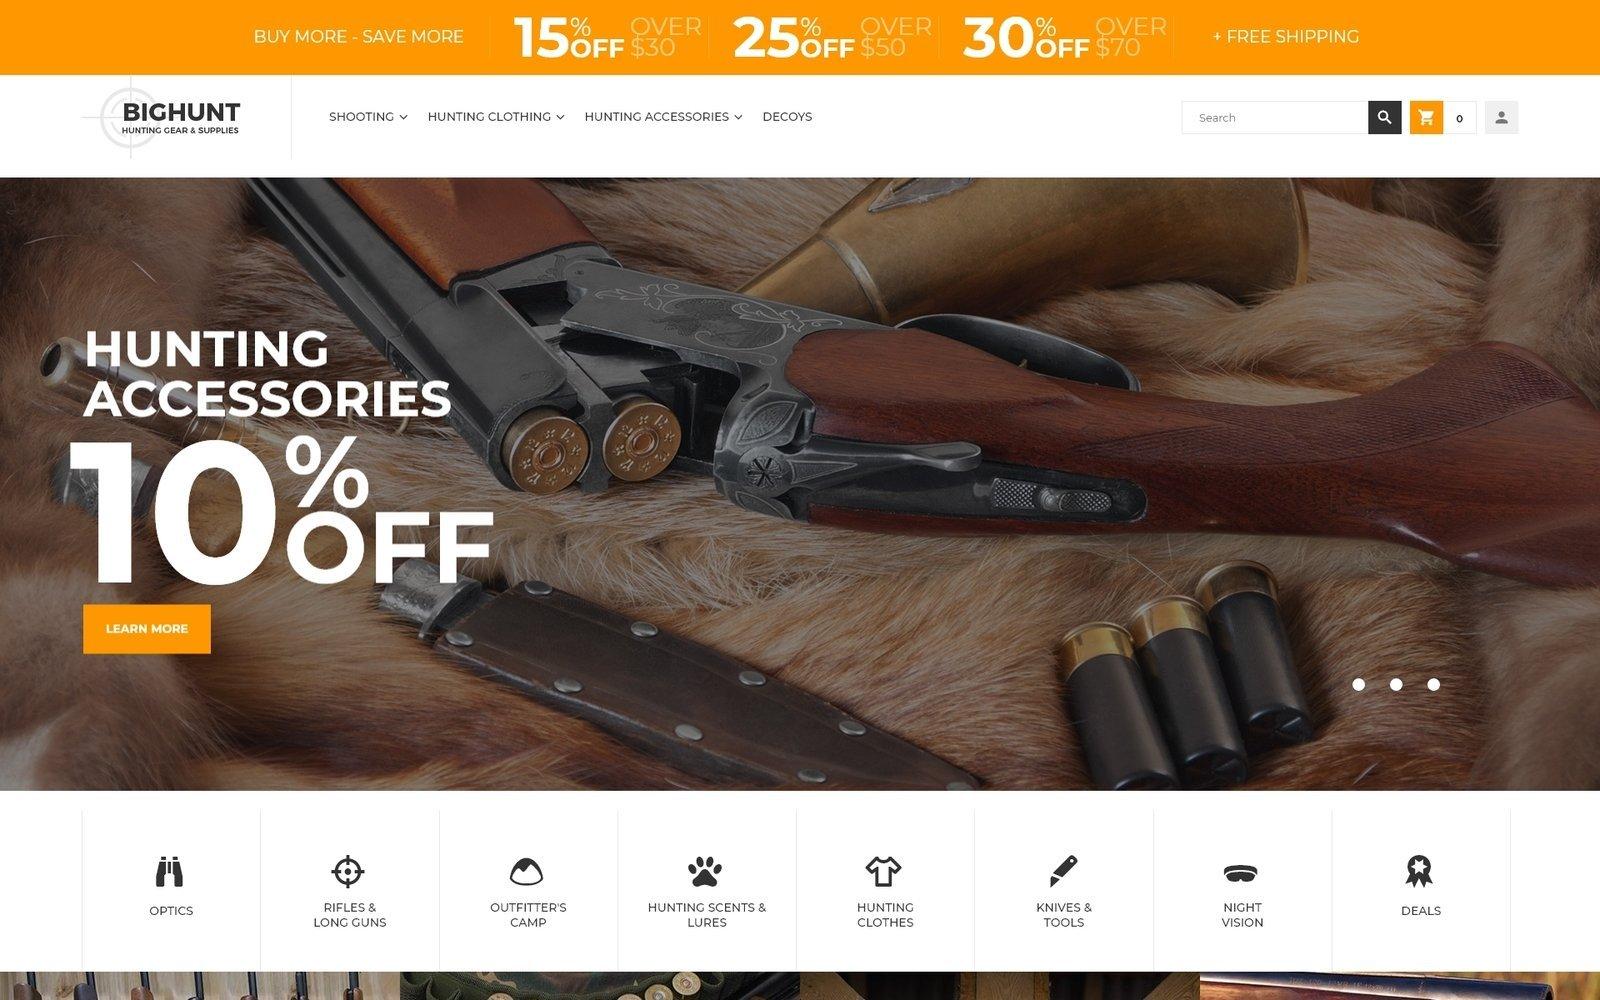 """BigHunt - Hunting Gear Store Template"" 响应式Magento模板 #62287"